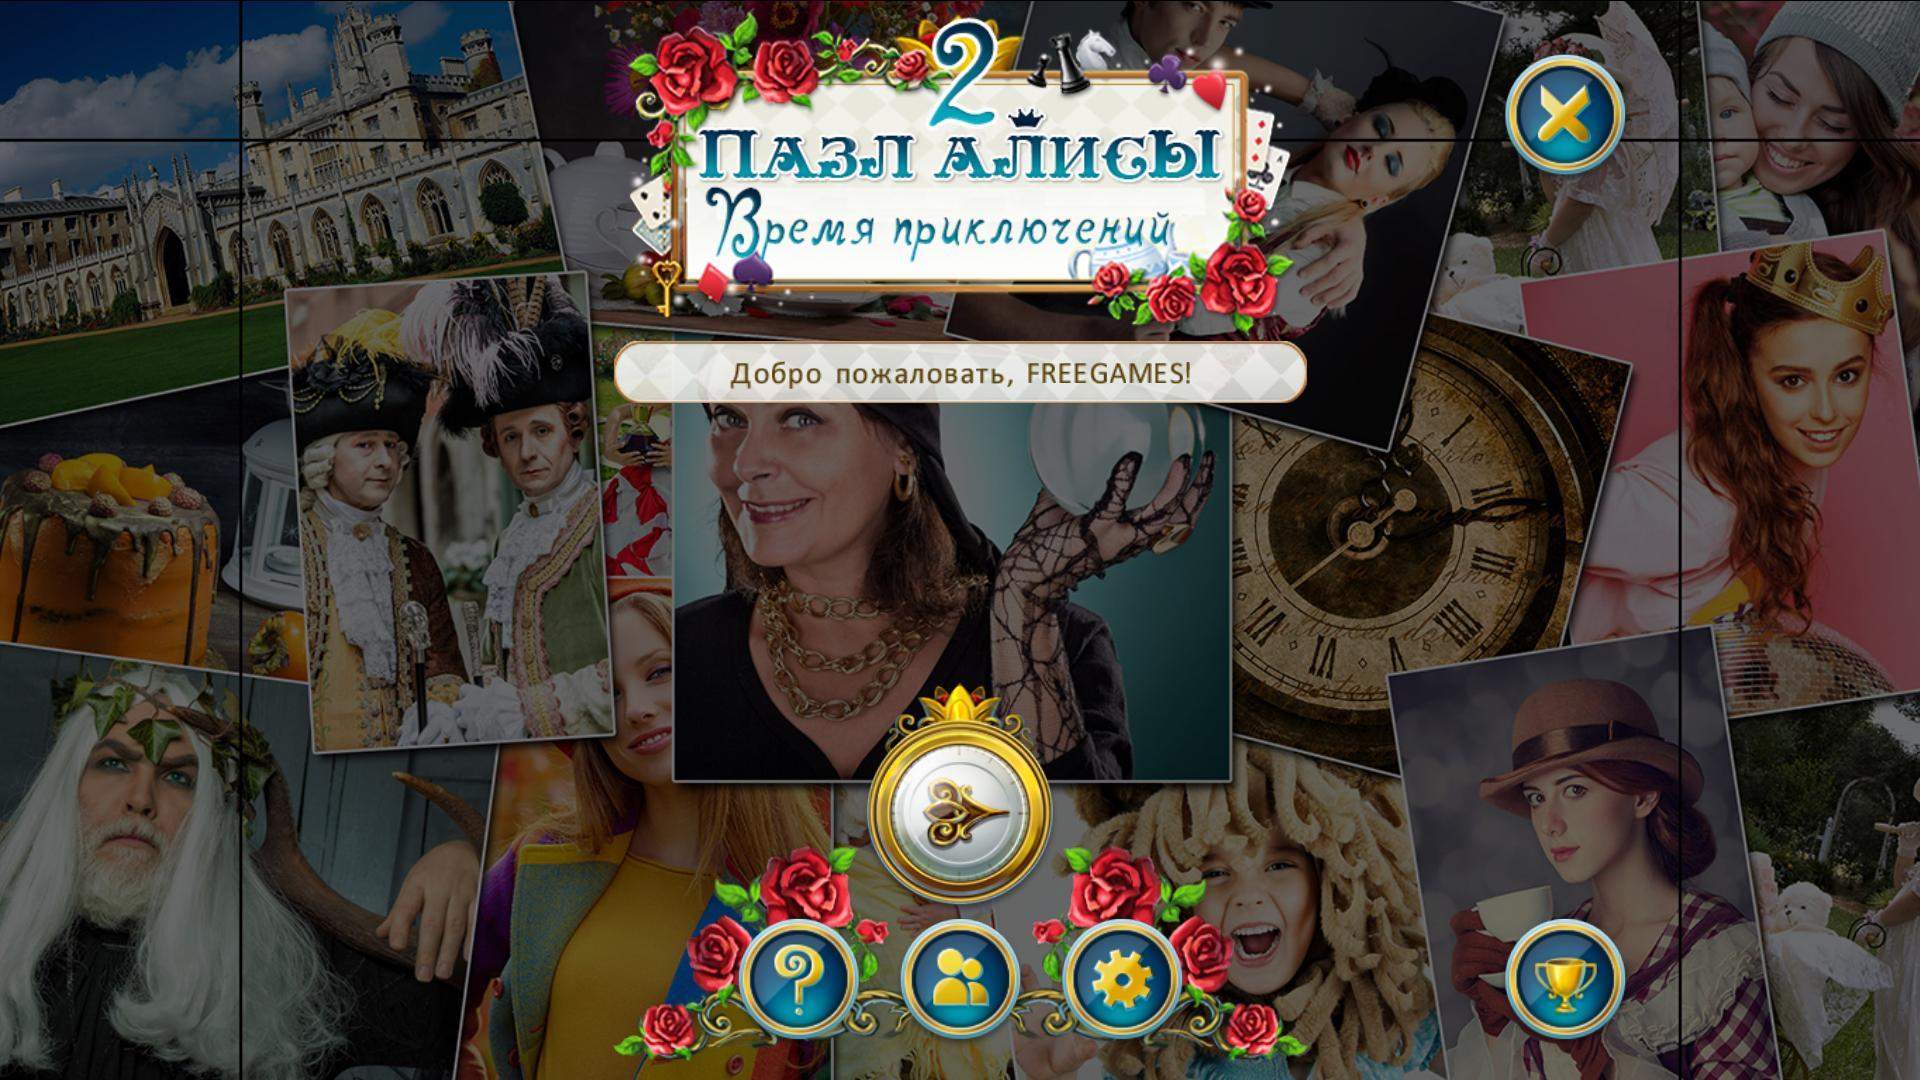 Пазл Алисы: Время приключений 2 | Alices Jigsaw: Time Travel 2 (Rus)